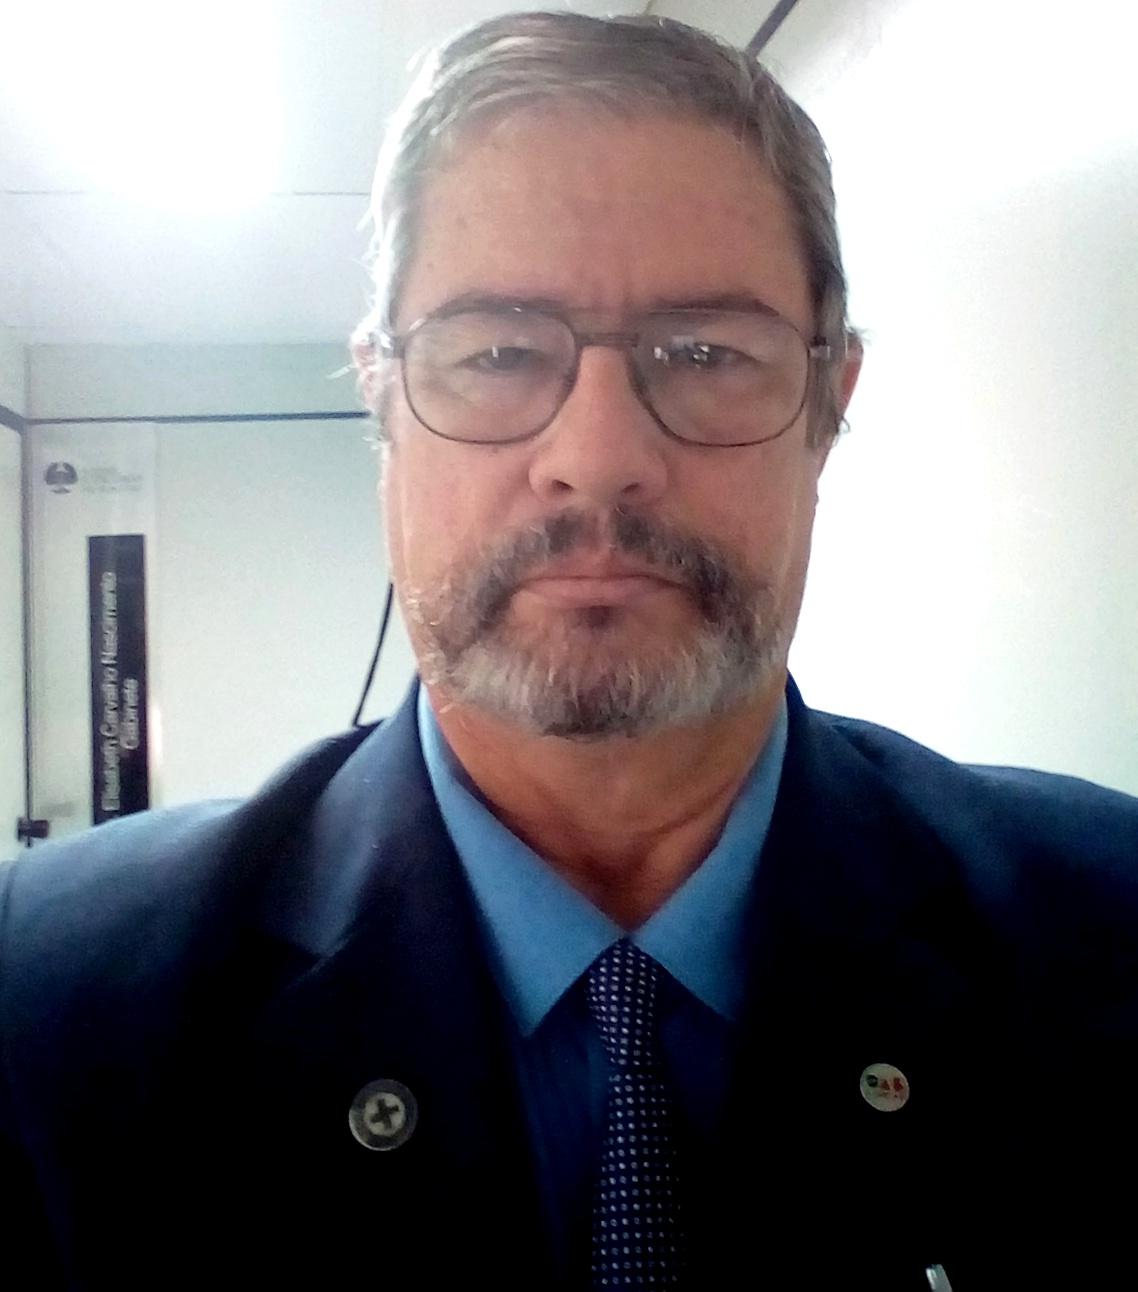 Roberto Jorge Ramalho Cavalcanti